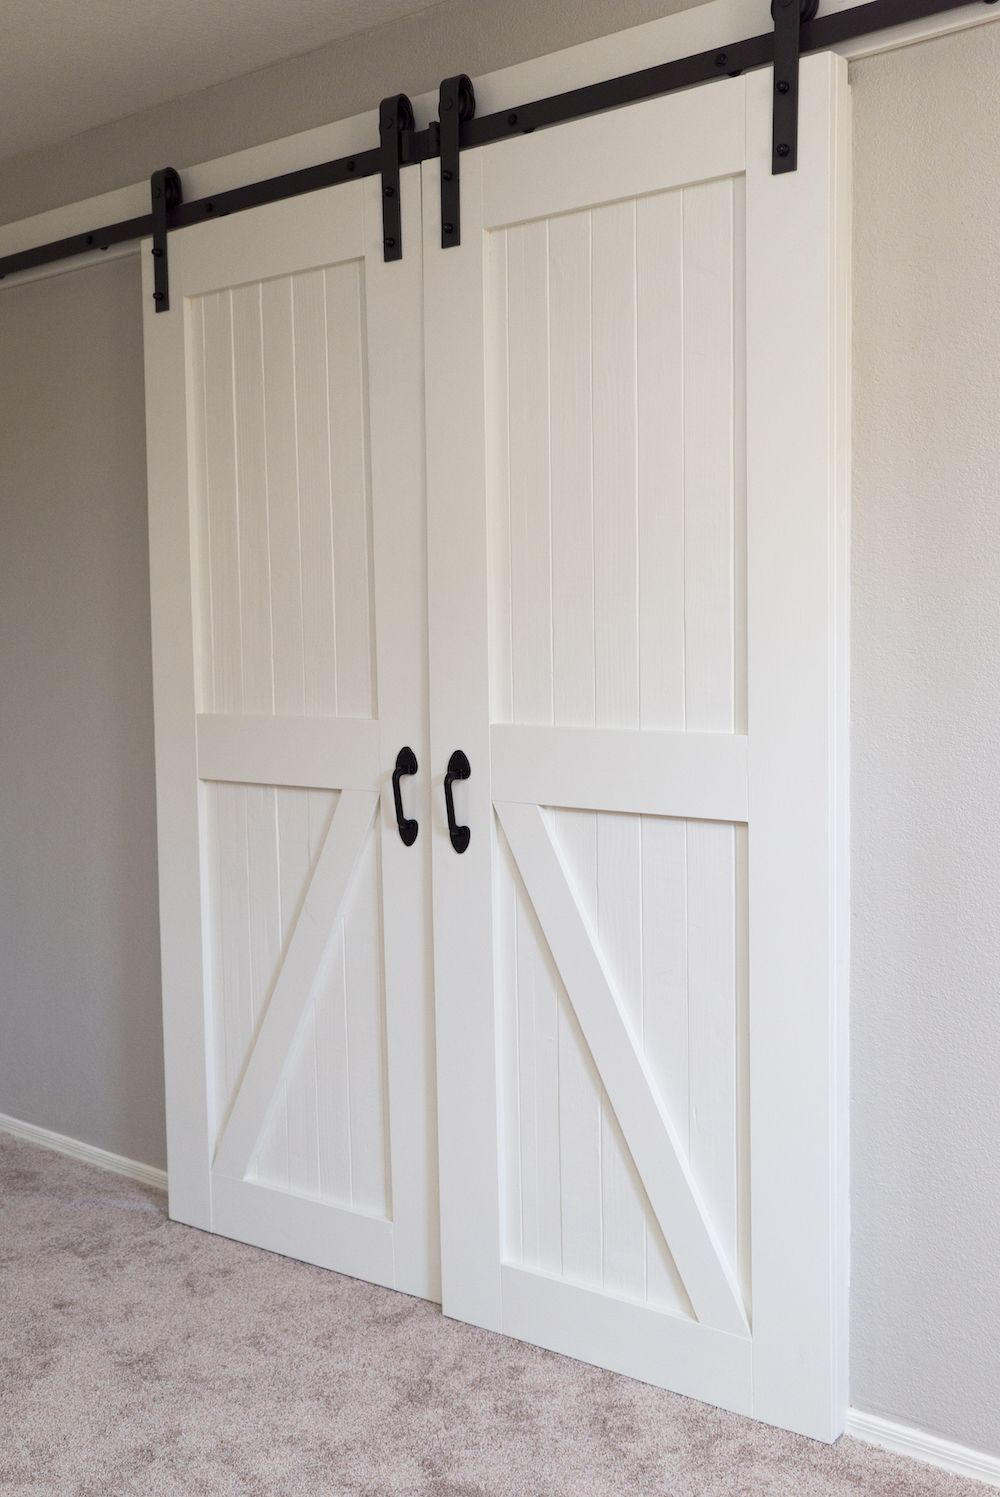 How To Build Barn Doors Cheap Barn Doors Double Barn Doors And